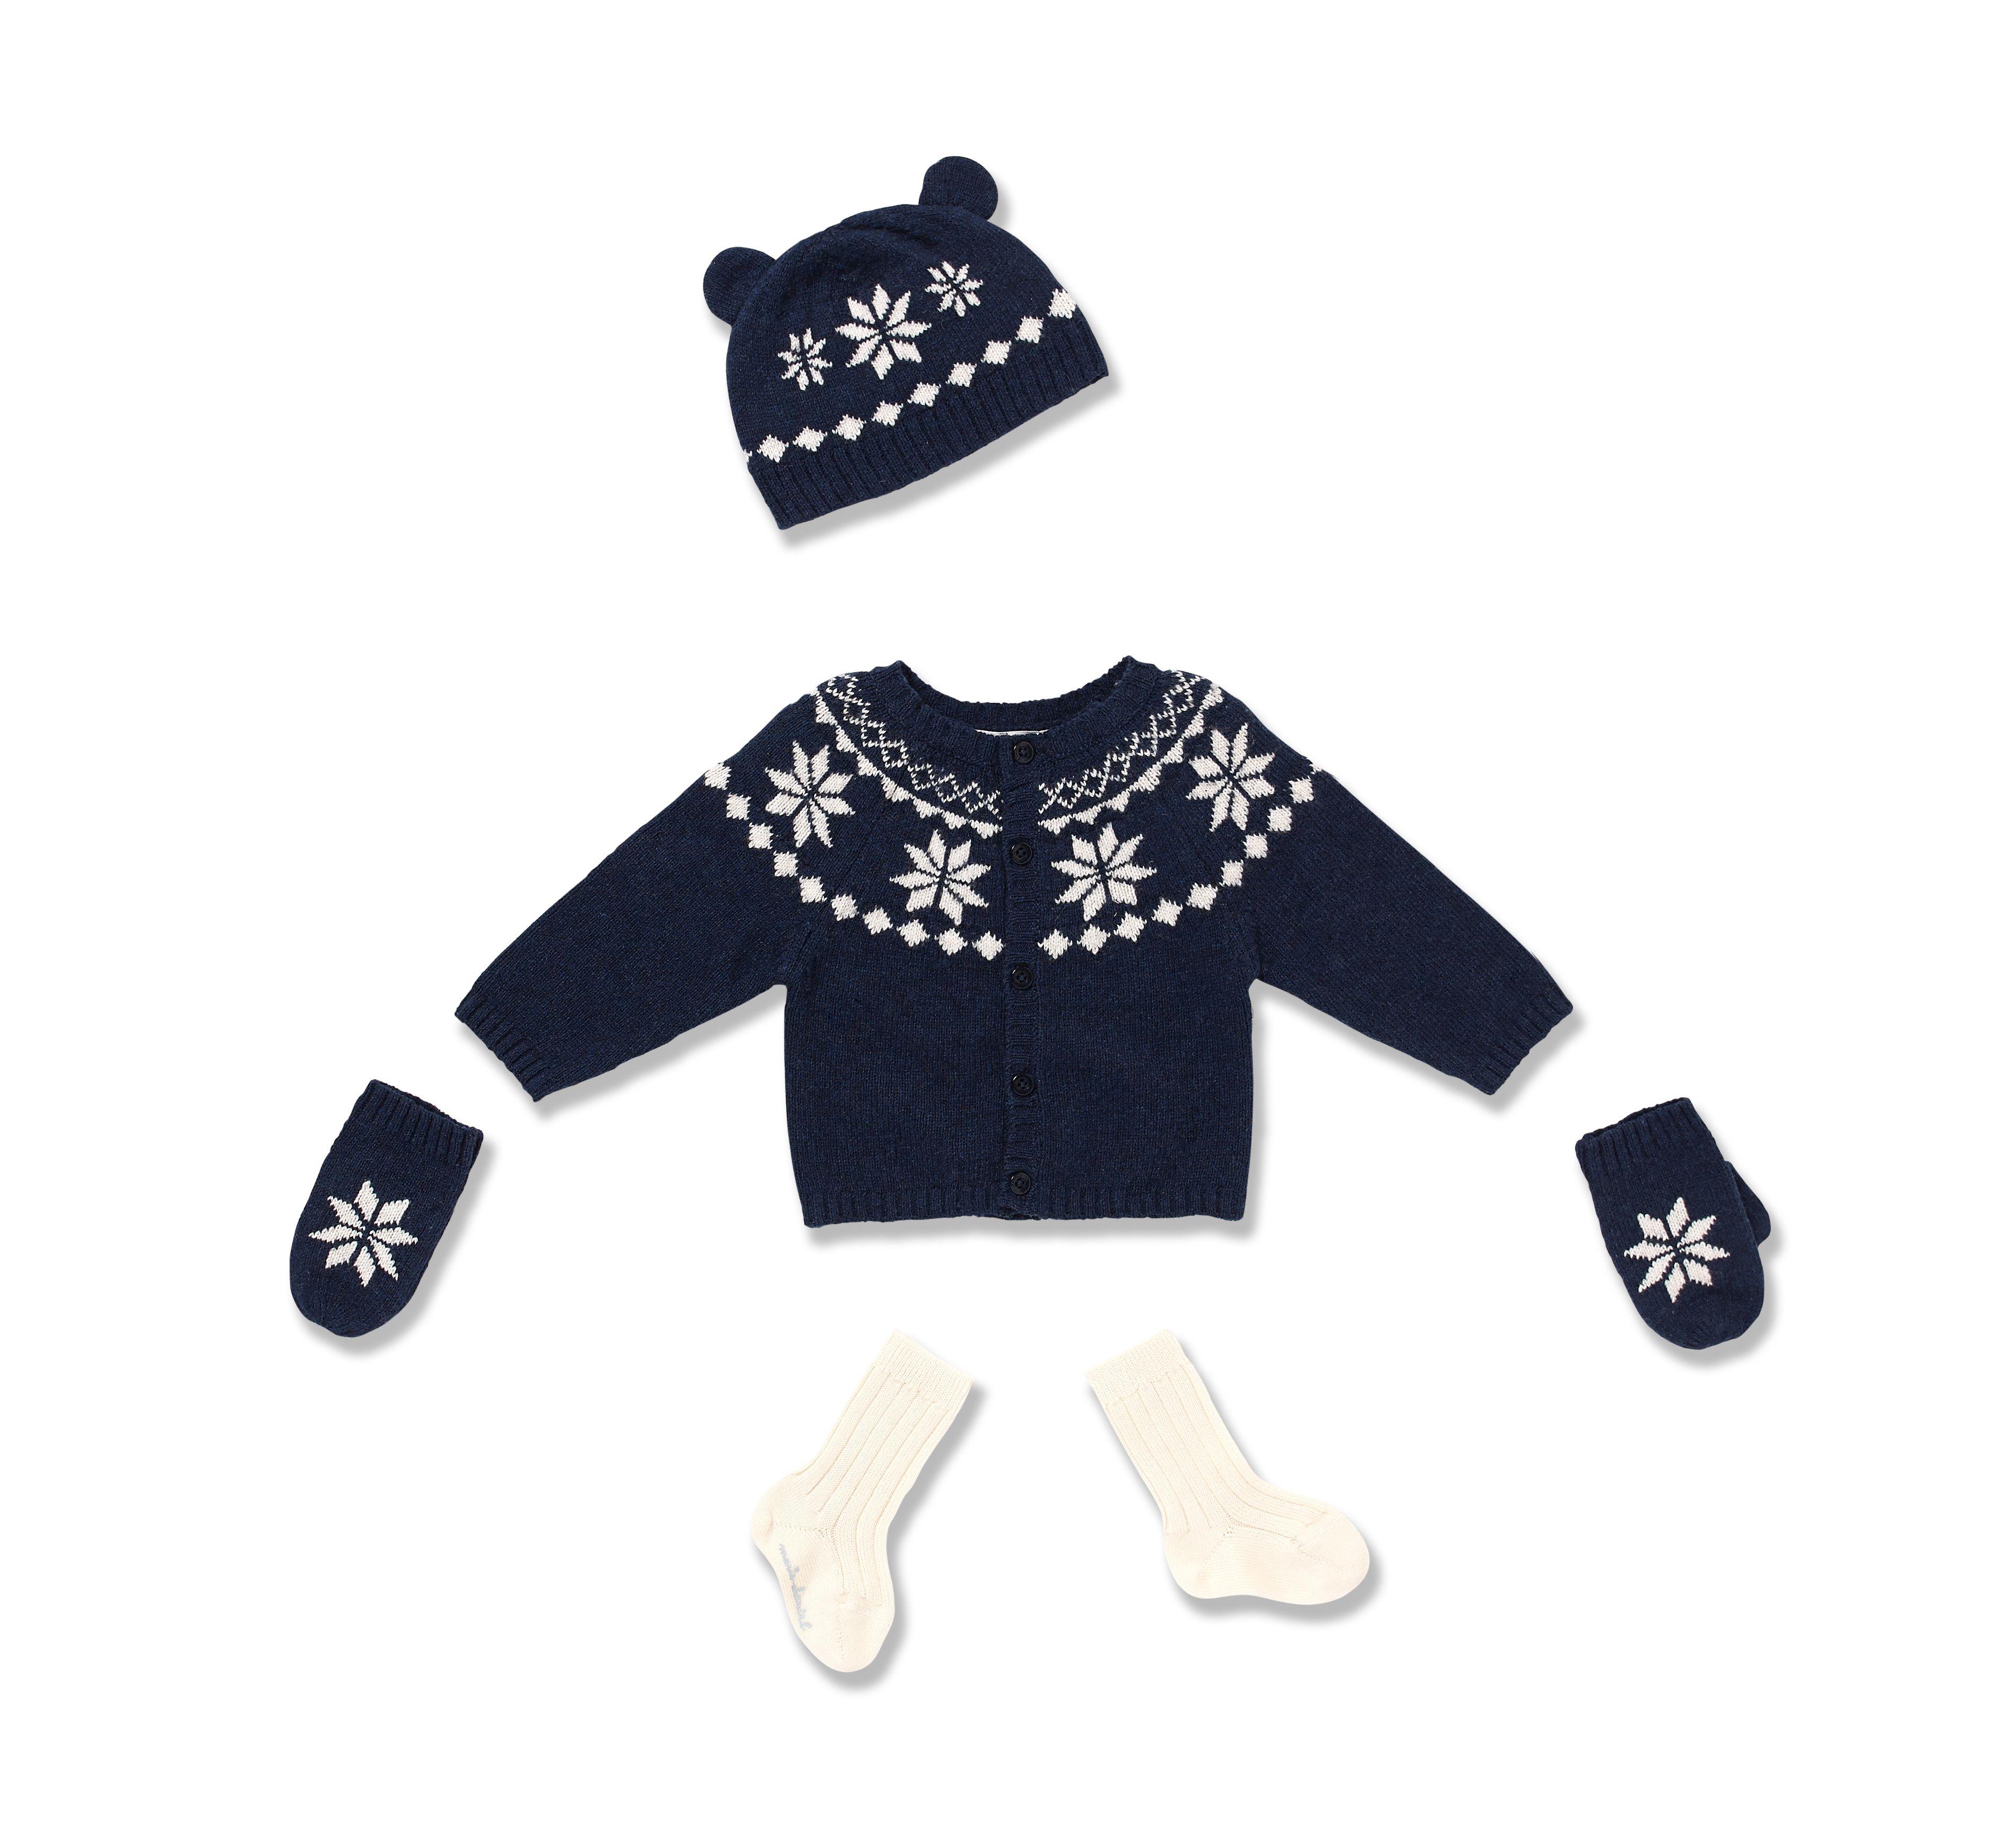 #MarieChantal #AW14 #Autumn #Winter #Baby #BabyBoy